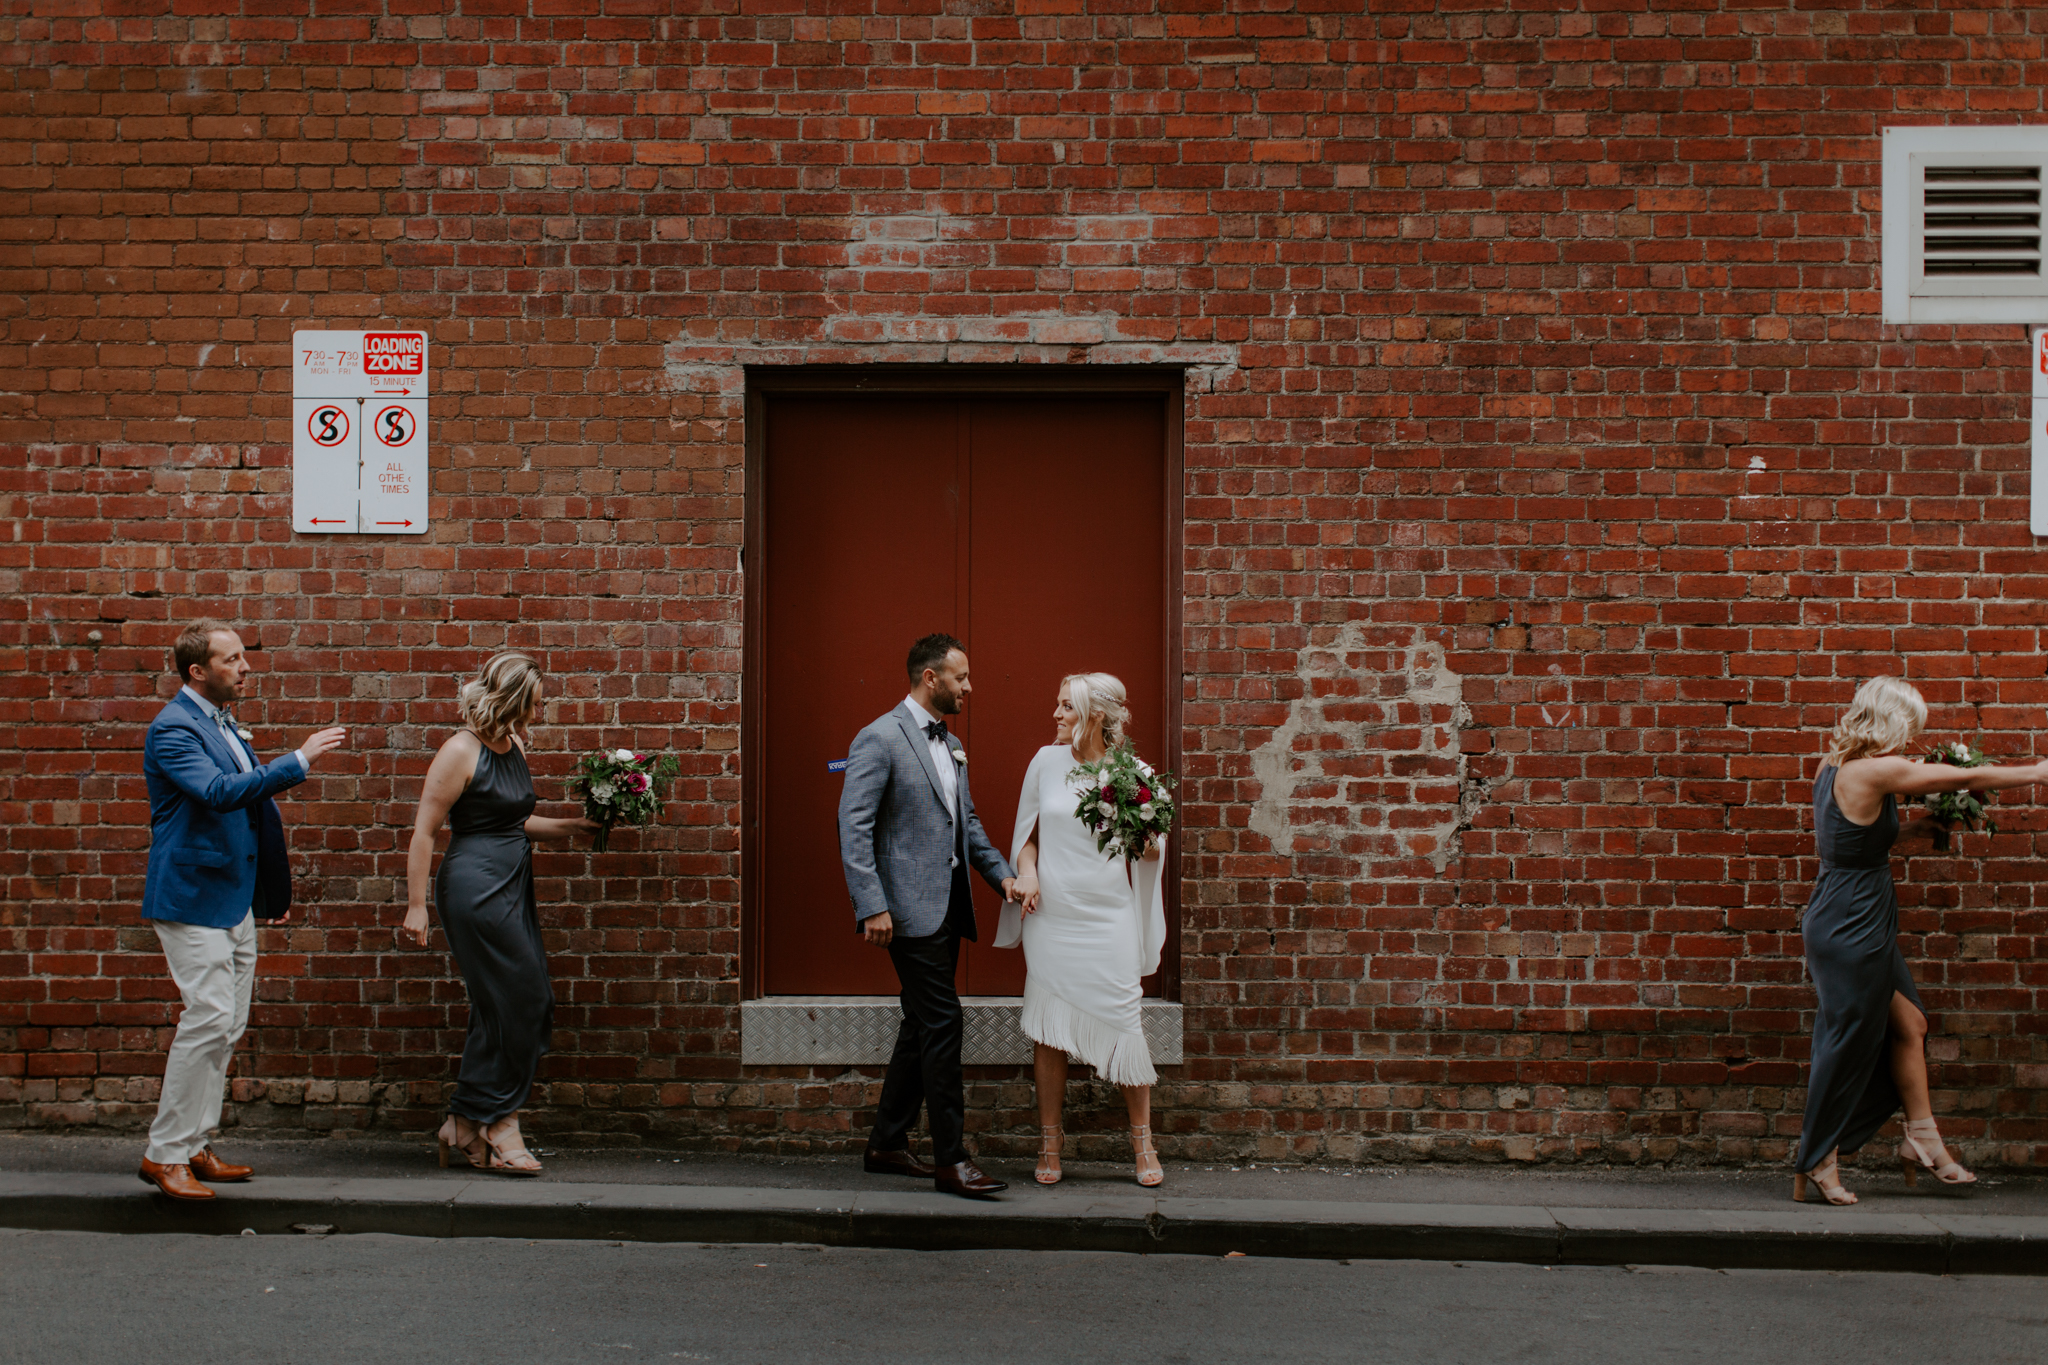 Trunk-restaurant-wedding-EmotionsandMath-023.jpg